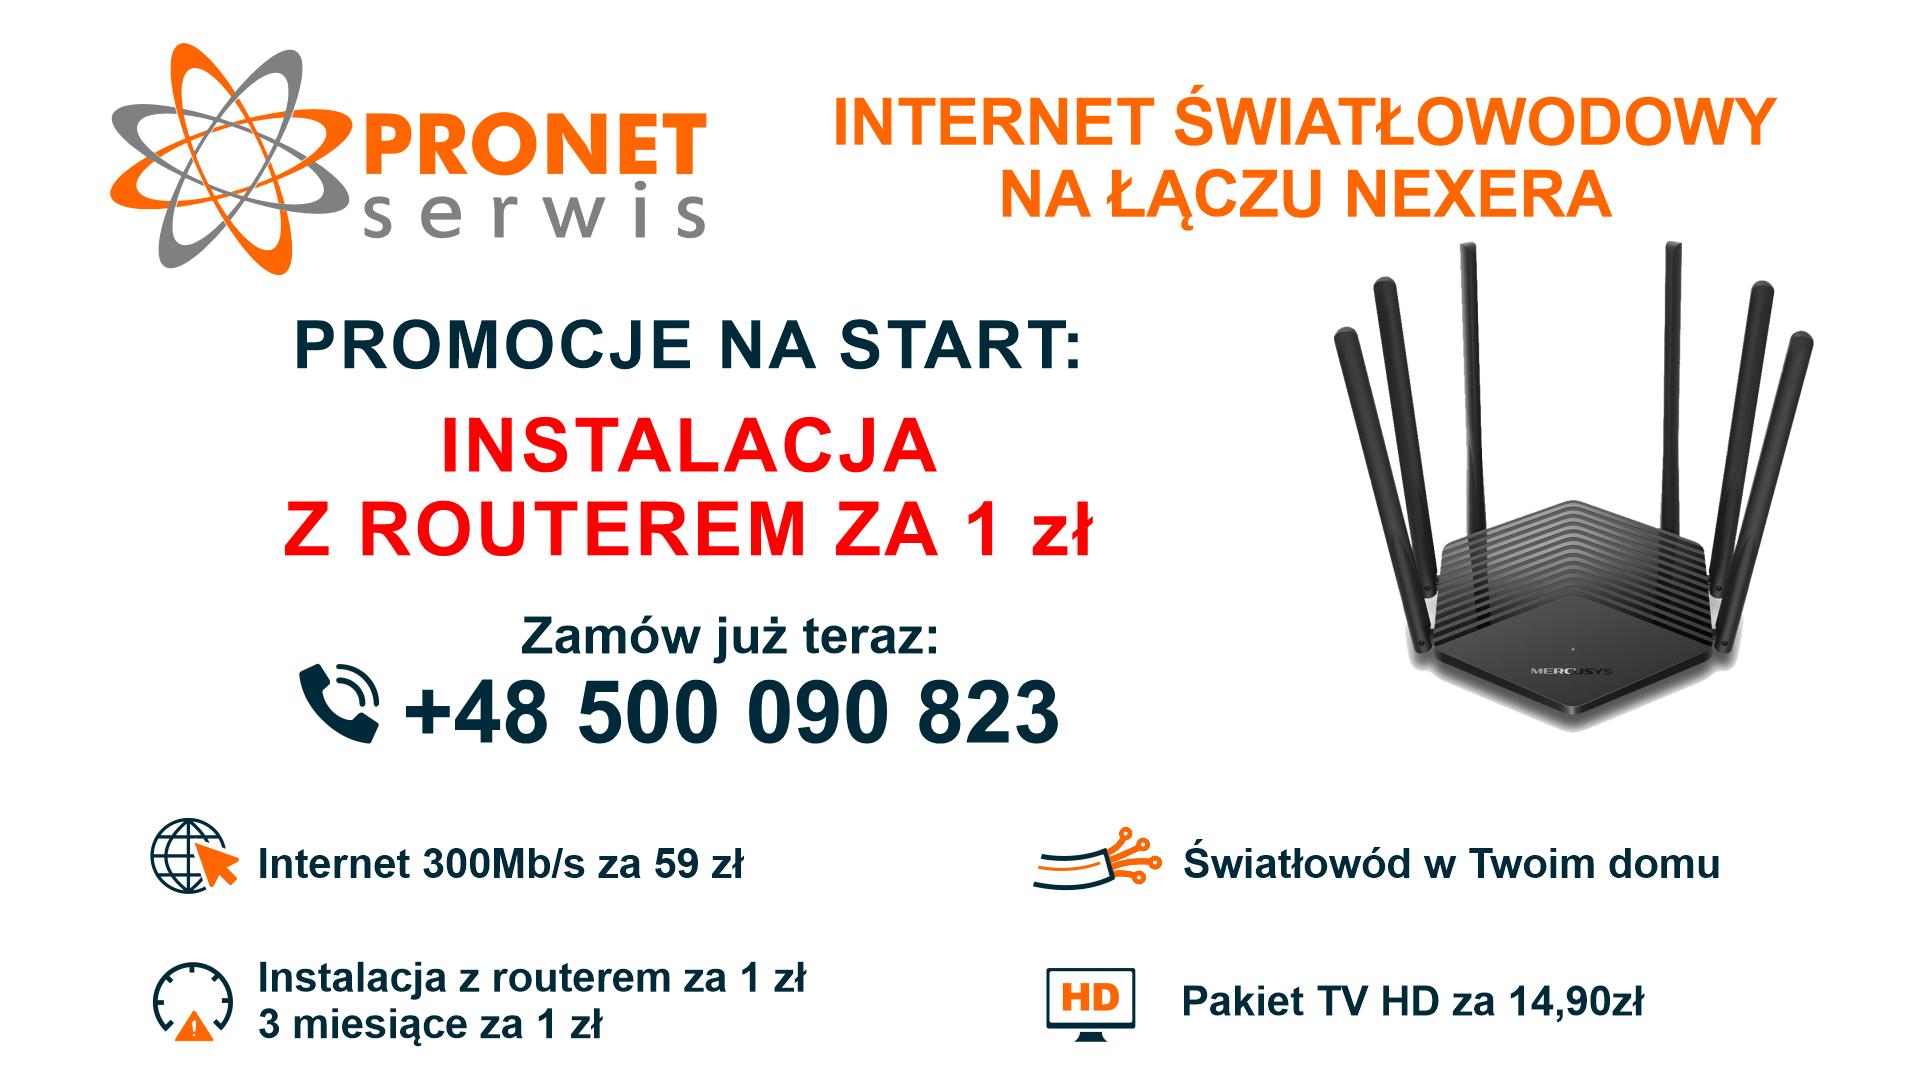 Instalacja z routerem za 1 zł!